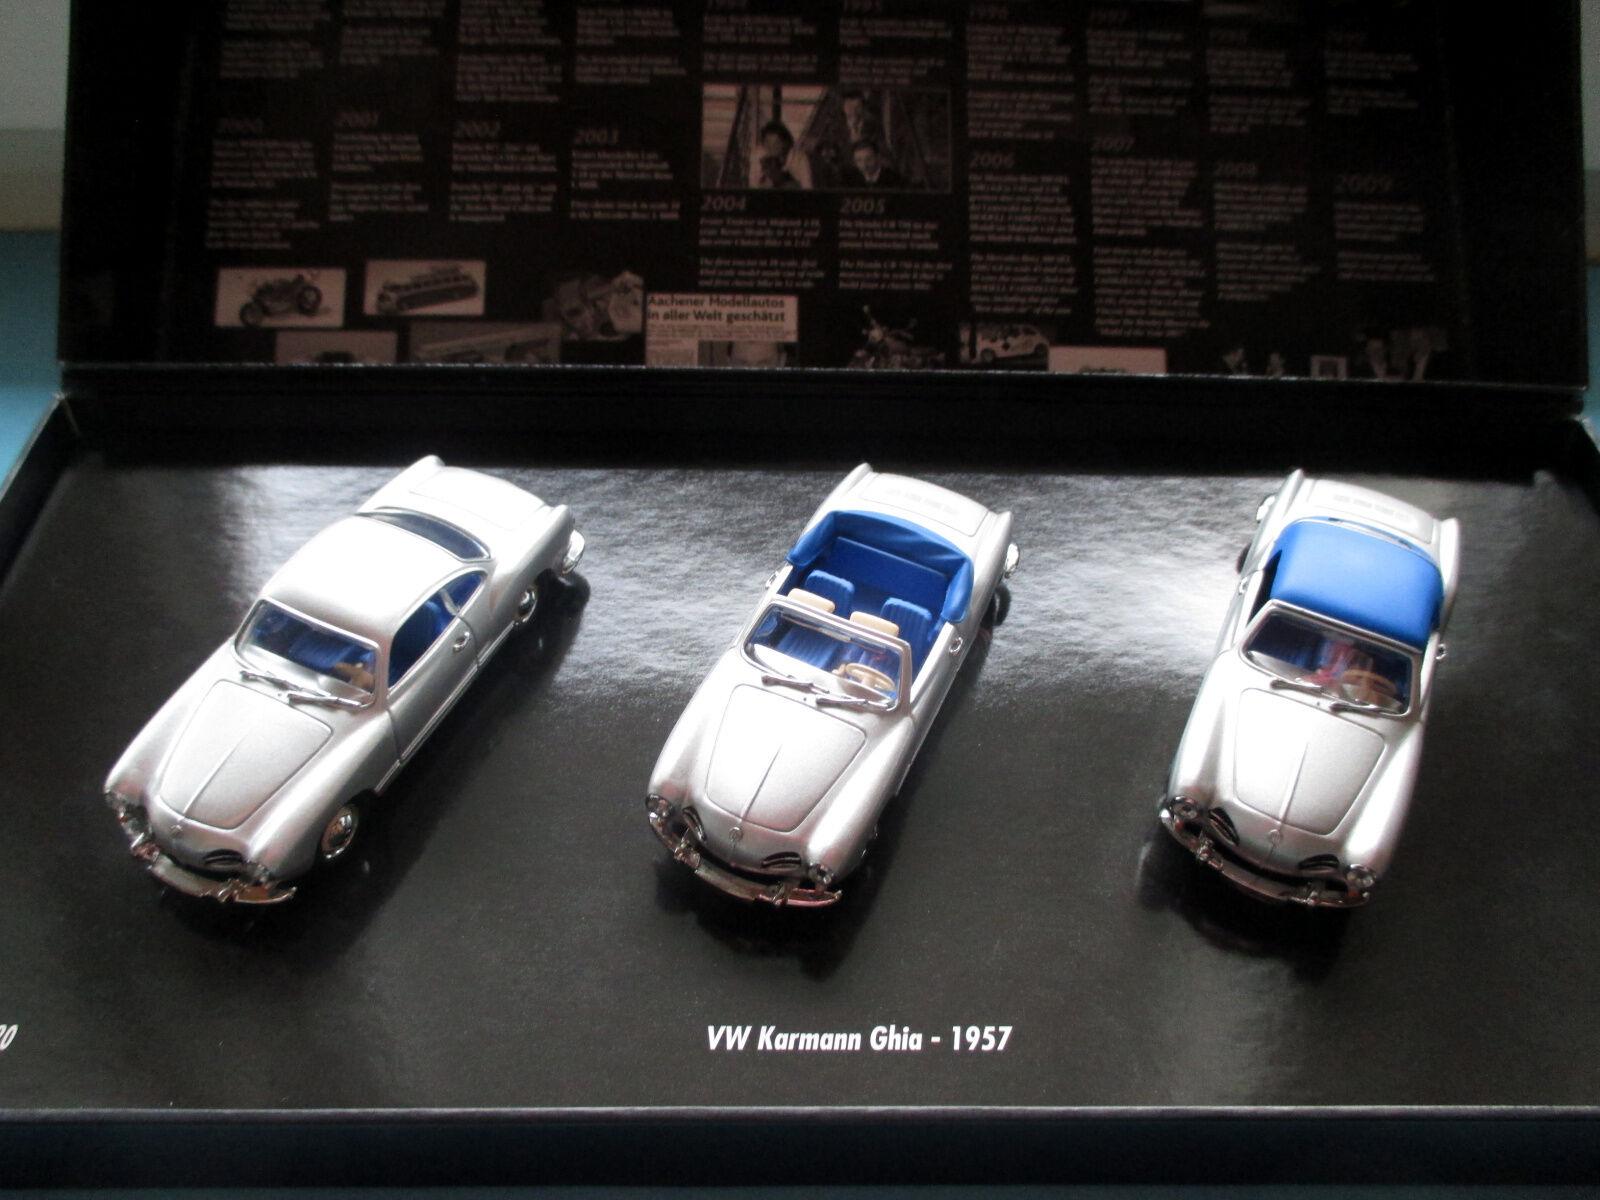 1990-2010 20 años Minichamps Karmann Ghia 1957 trío-set limitado 320 PCs.